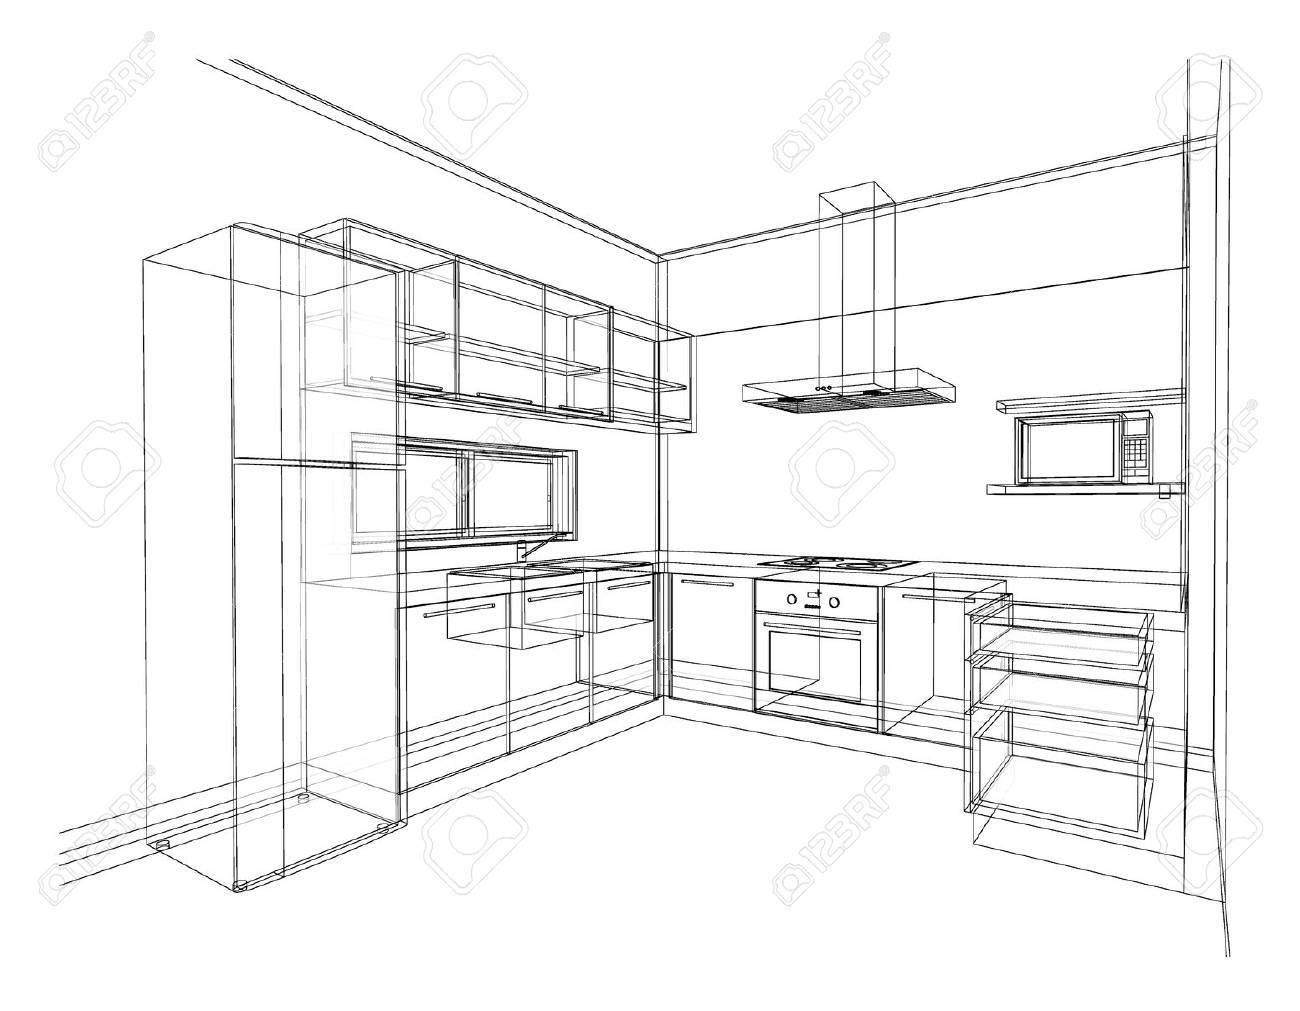 Innenarchitektur Der Modernen Küche, Rahmen Skizze 3D-Draht ...